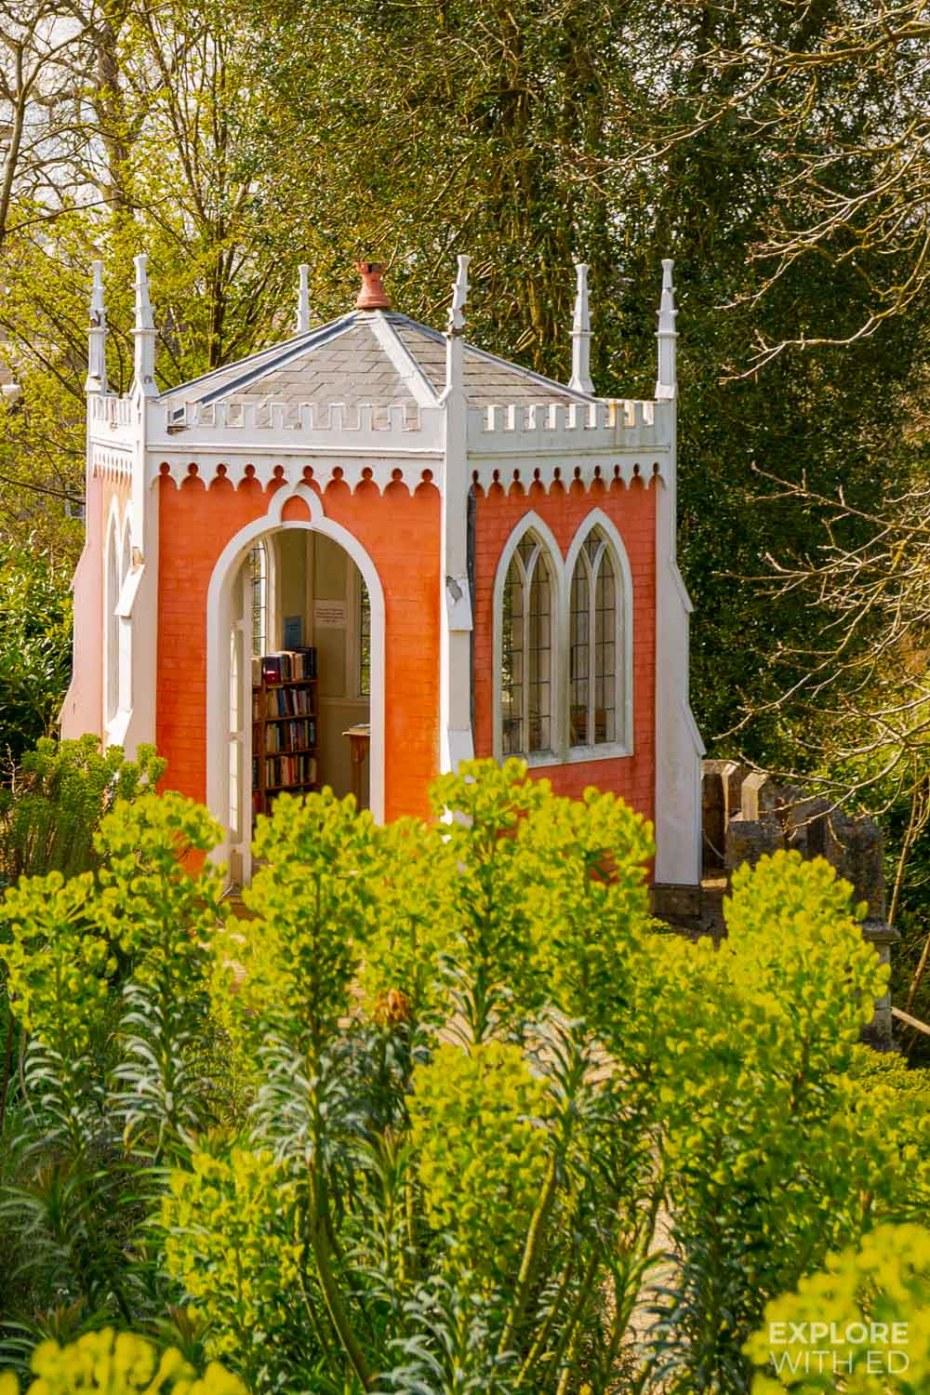 Rococo Style red garden building in Painswick Garden